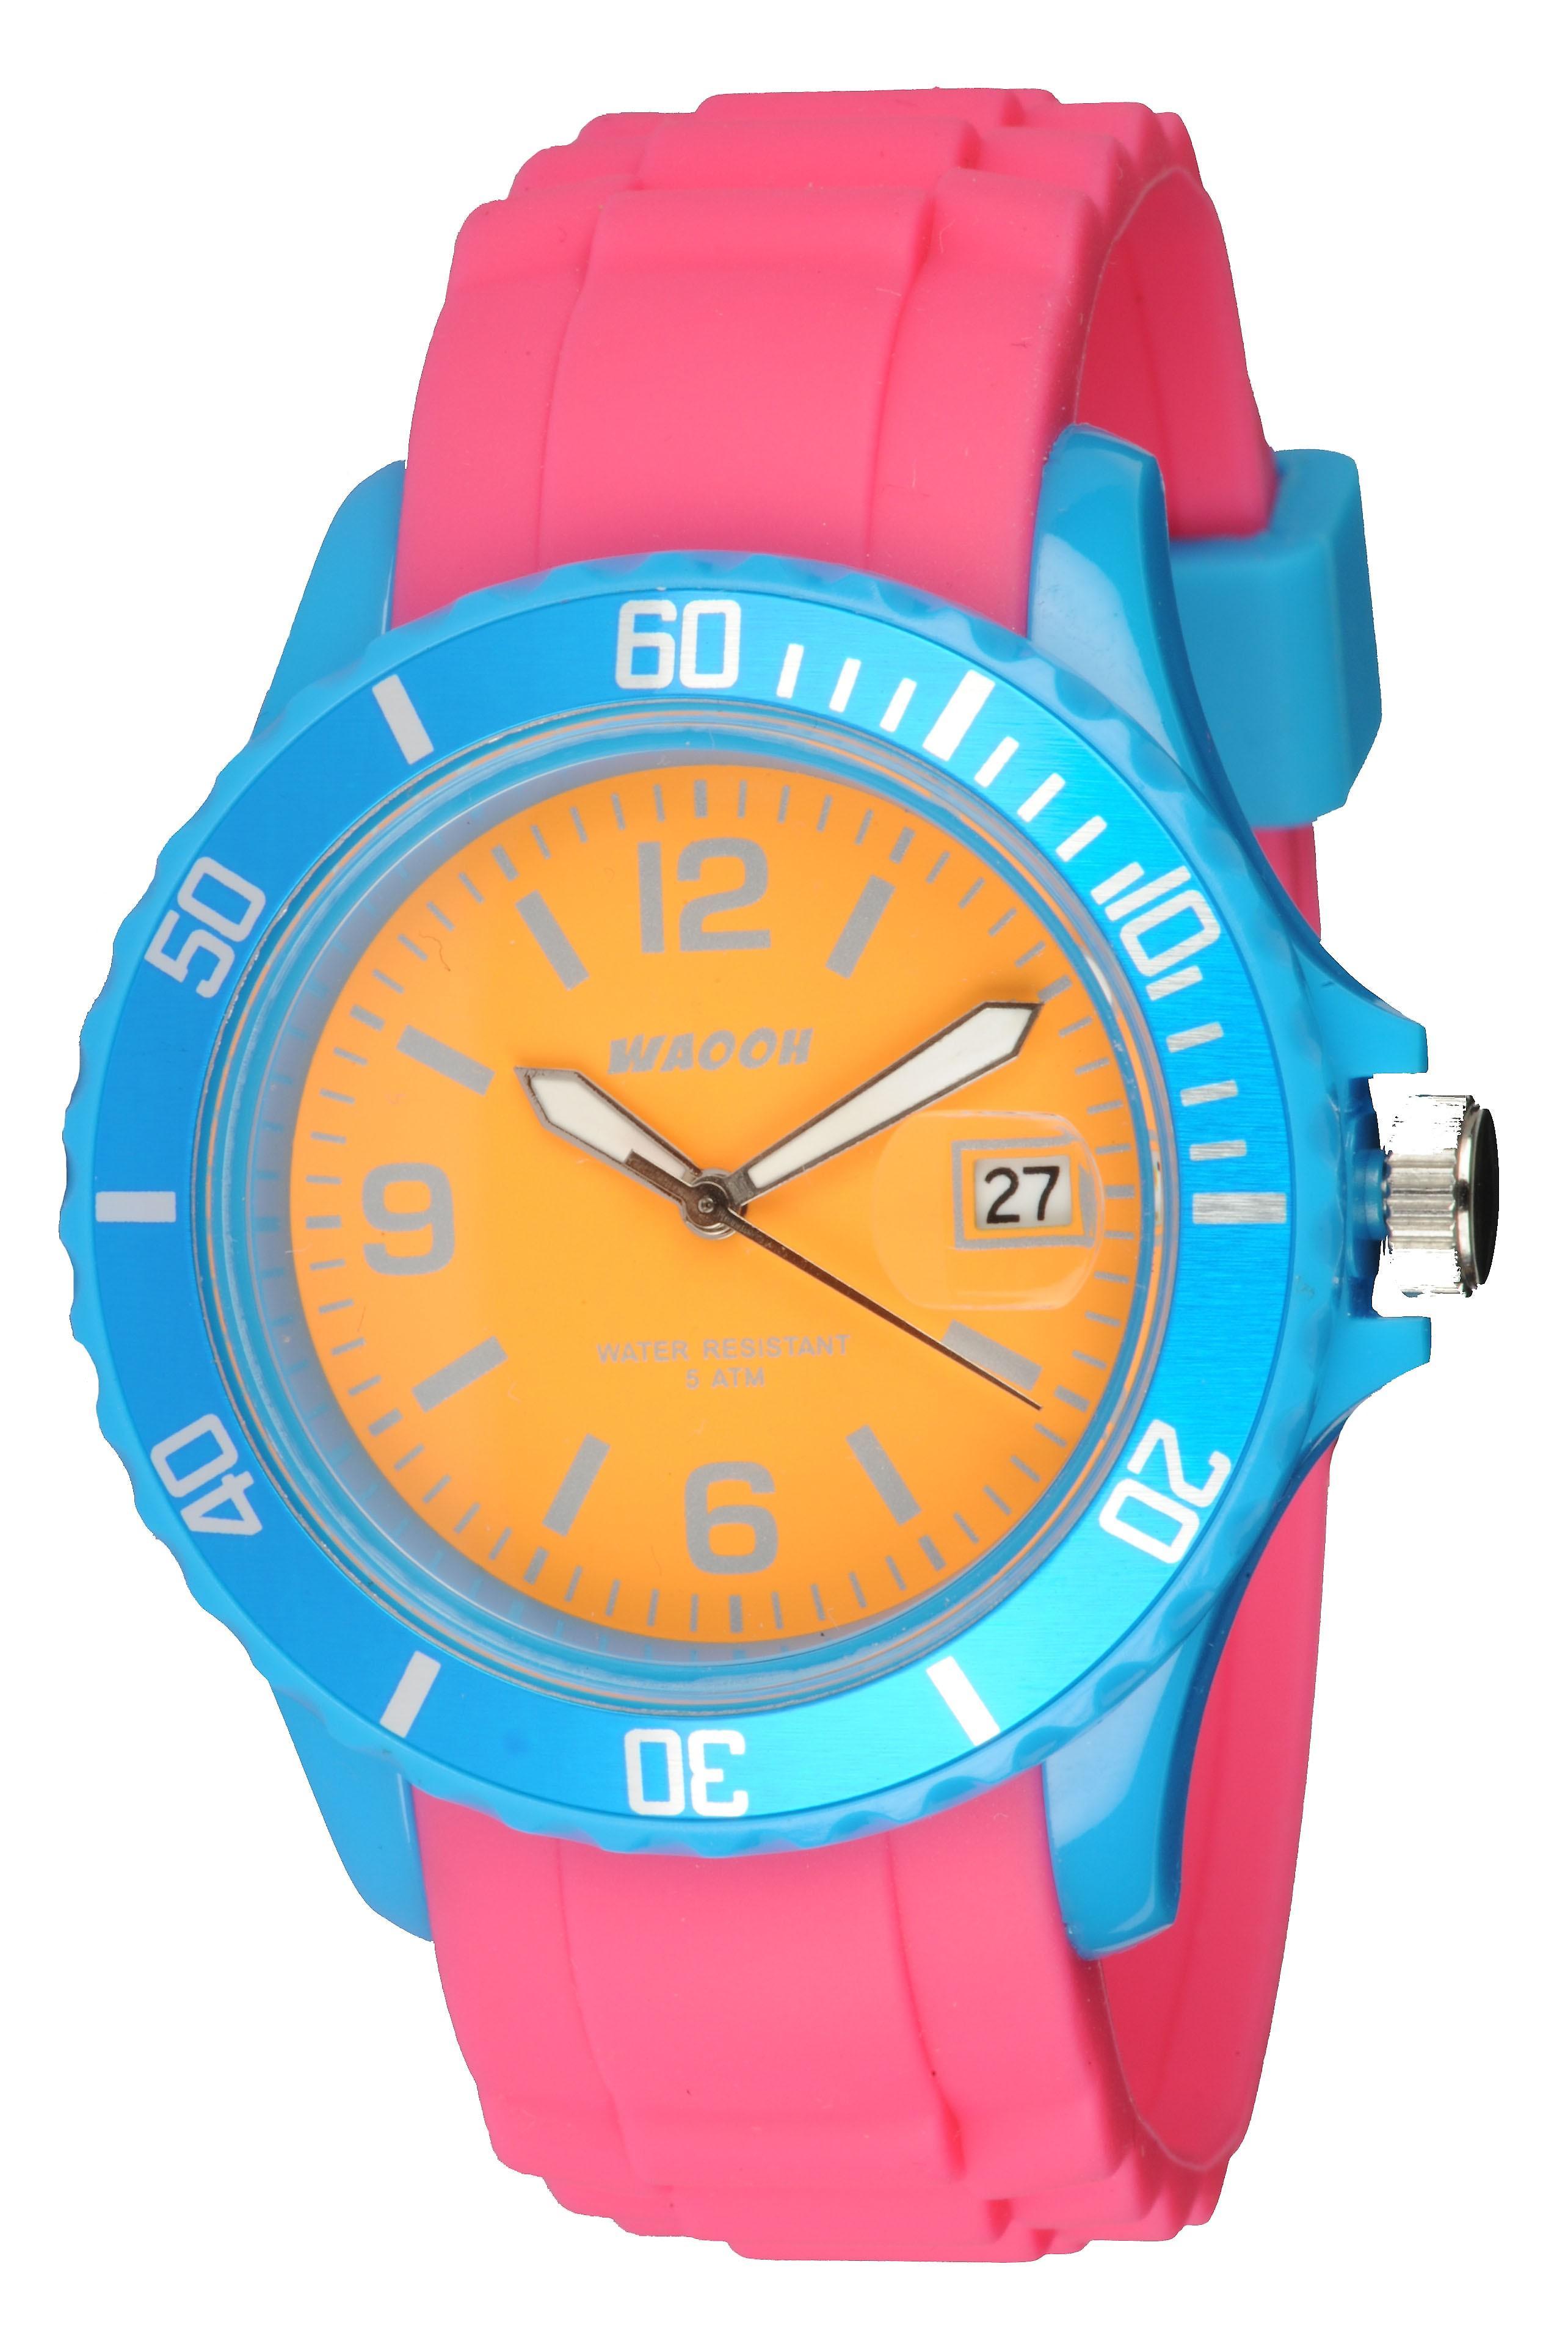 Waooh - Watch Monaco38 - Tricolore & turquoise